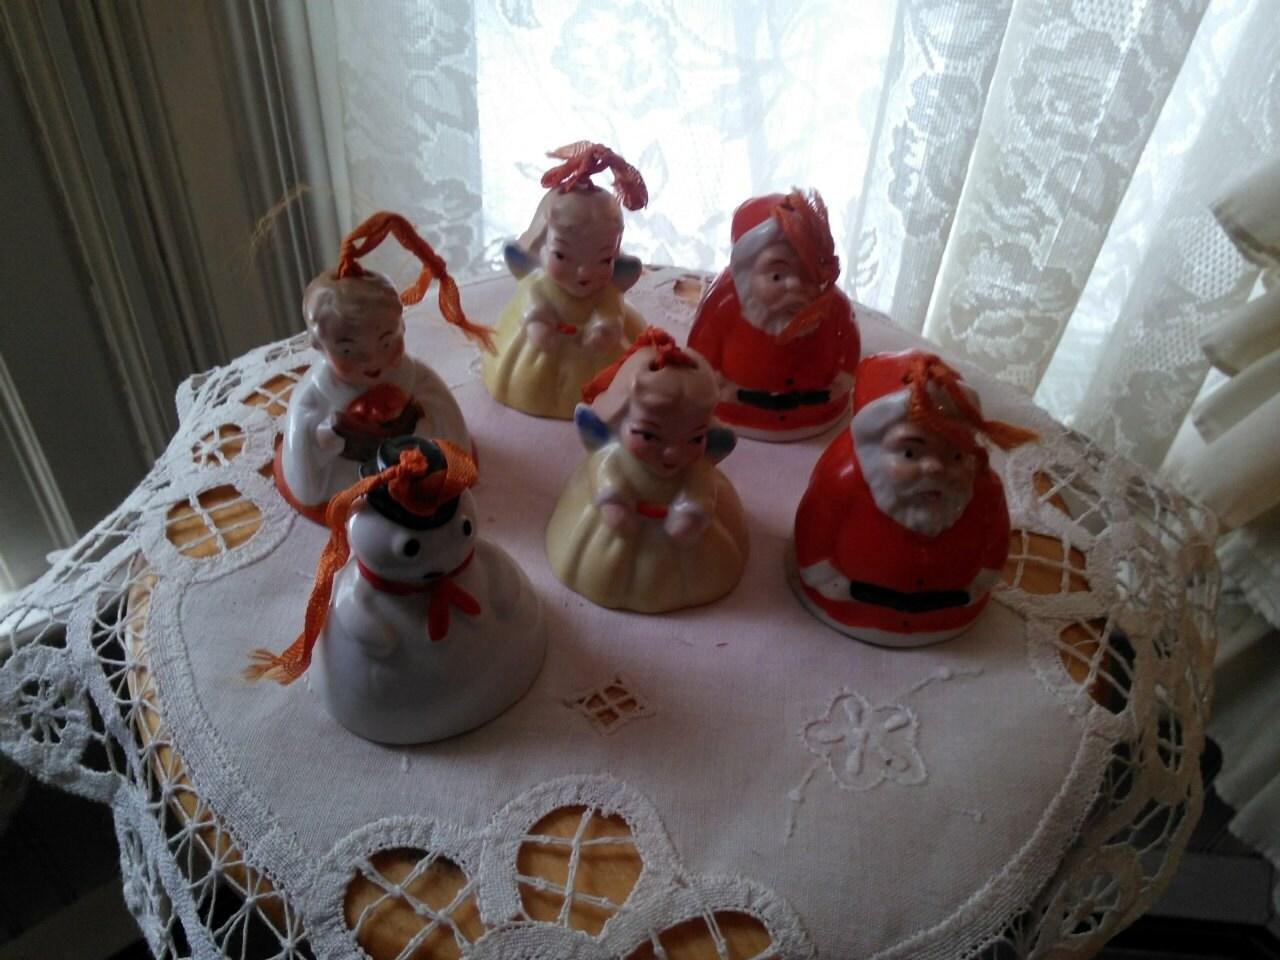 Americana christmas ornaments - 1920 Antique Porcelain Figures Christmas Bells Ornaments Set Of 6 Made In Japan Ogb Shelf Sitter Primitive Americana